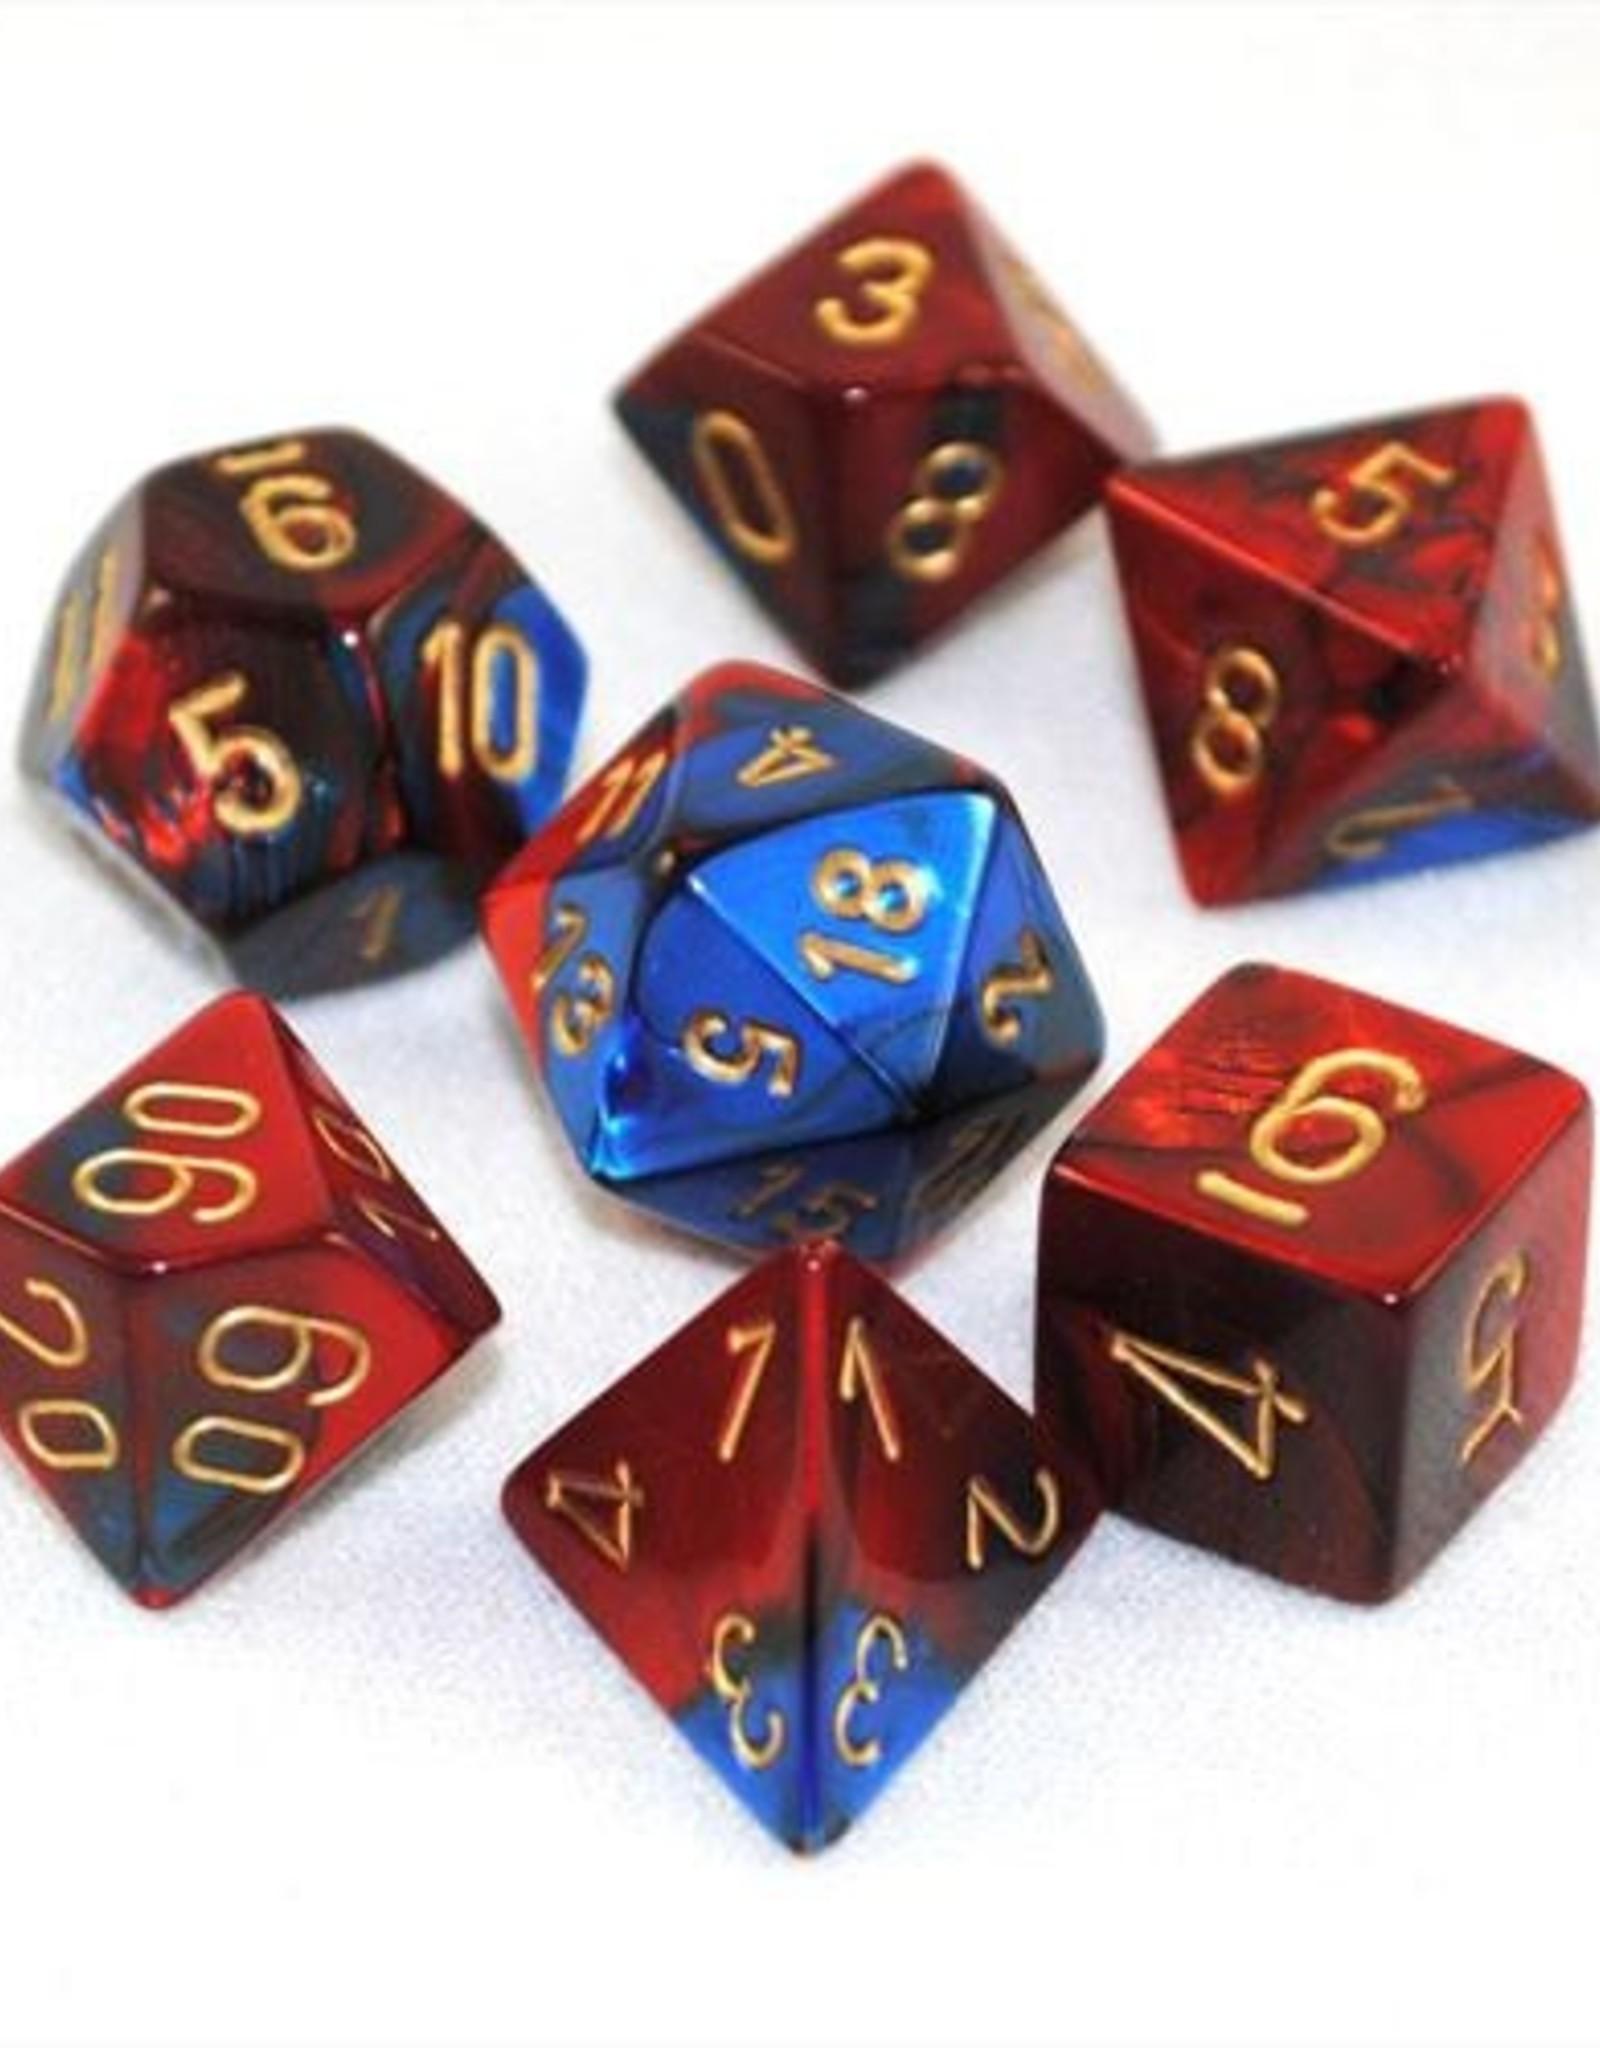 Chessex Chessex 7-Die set Gemini - Blue-Red/Gold